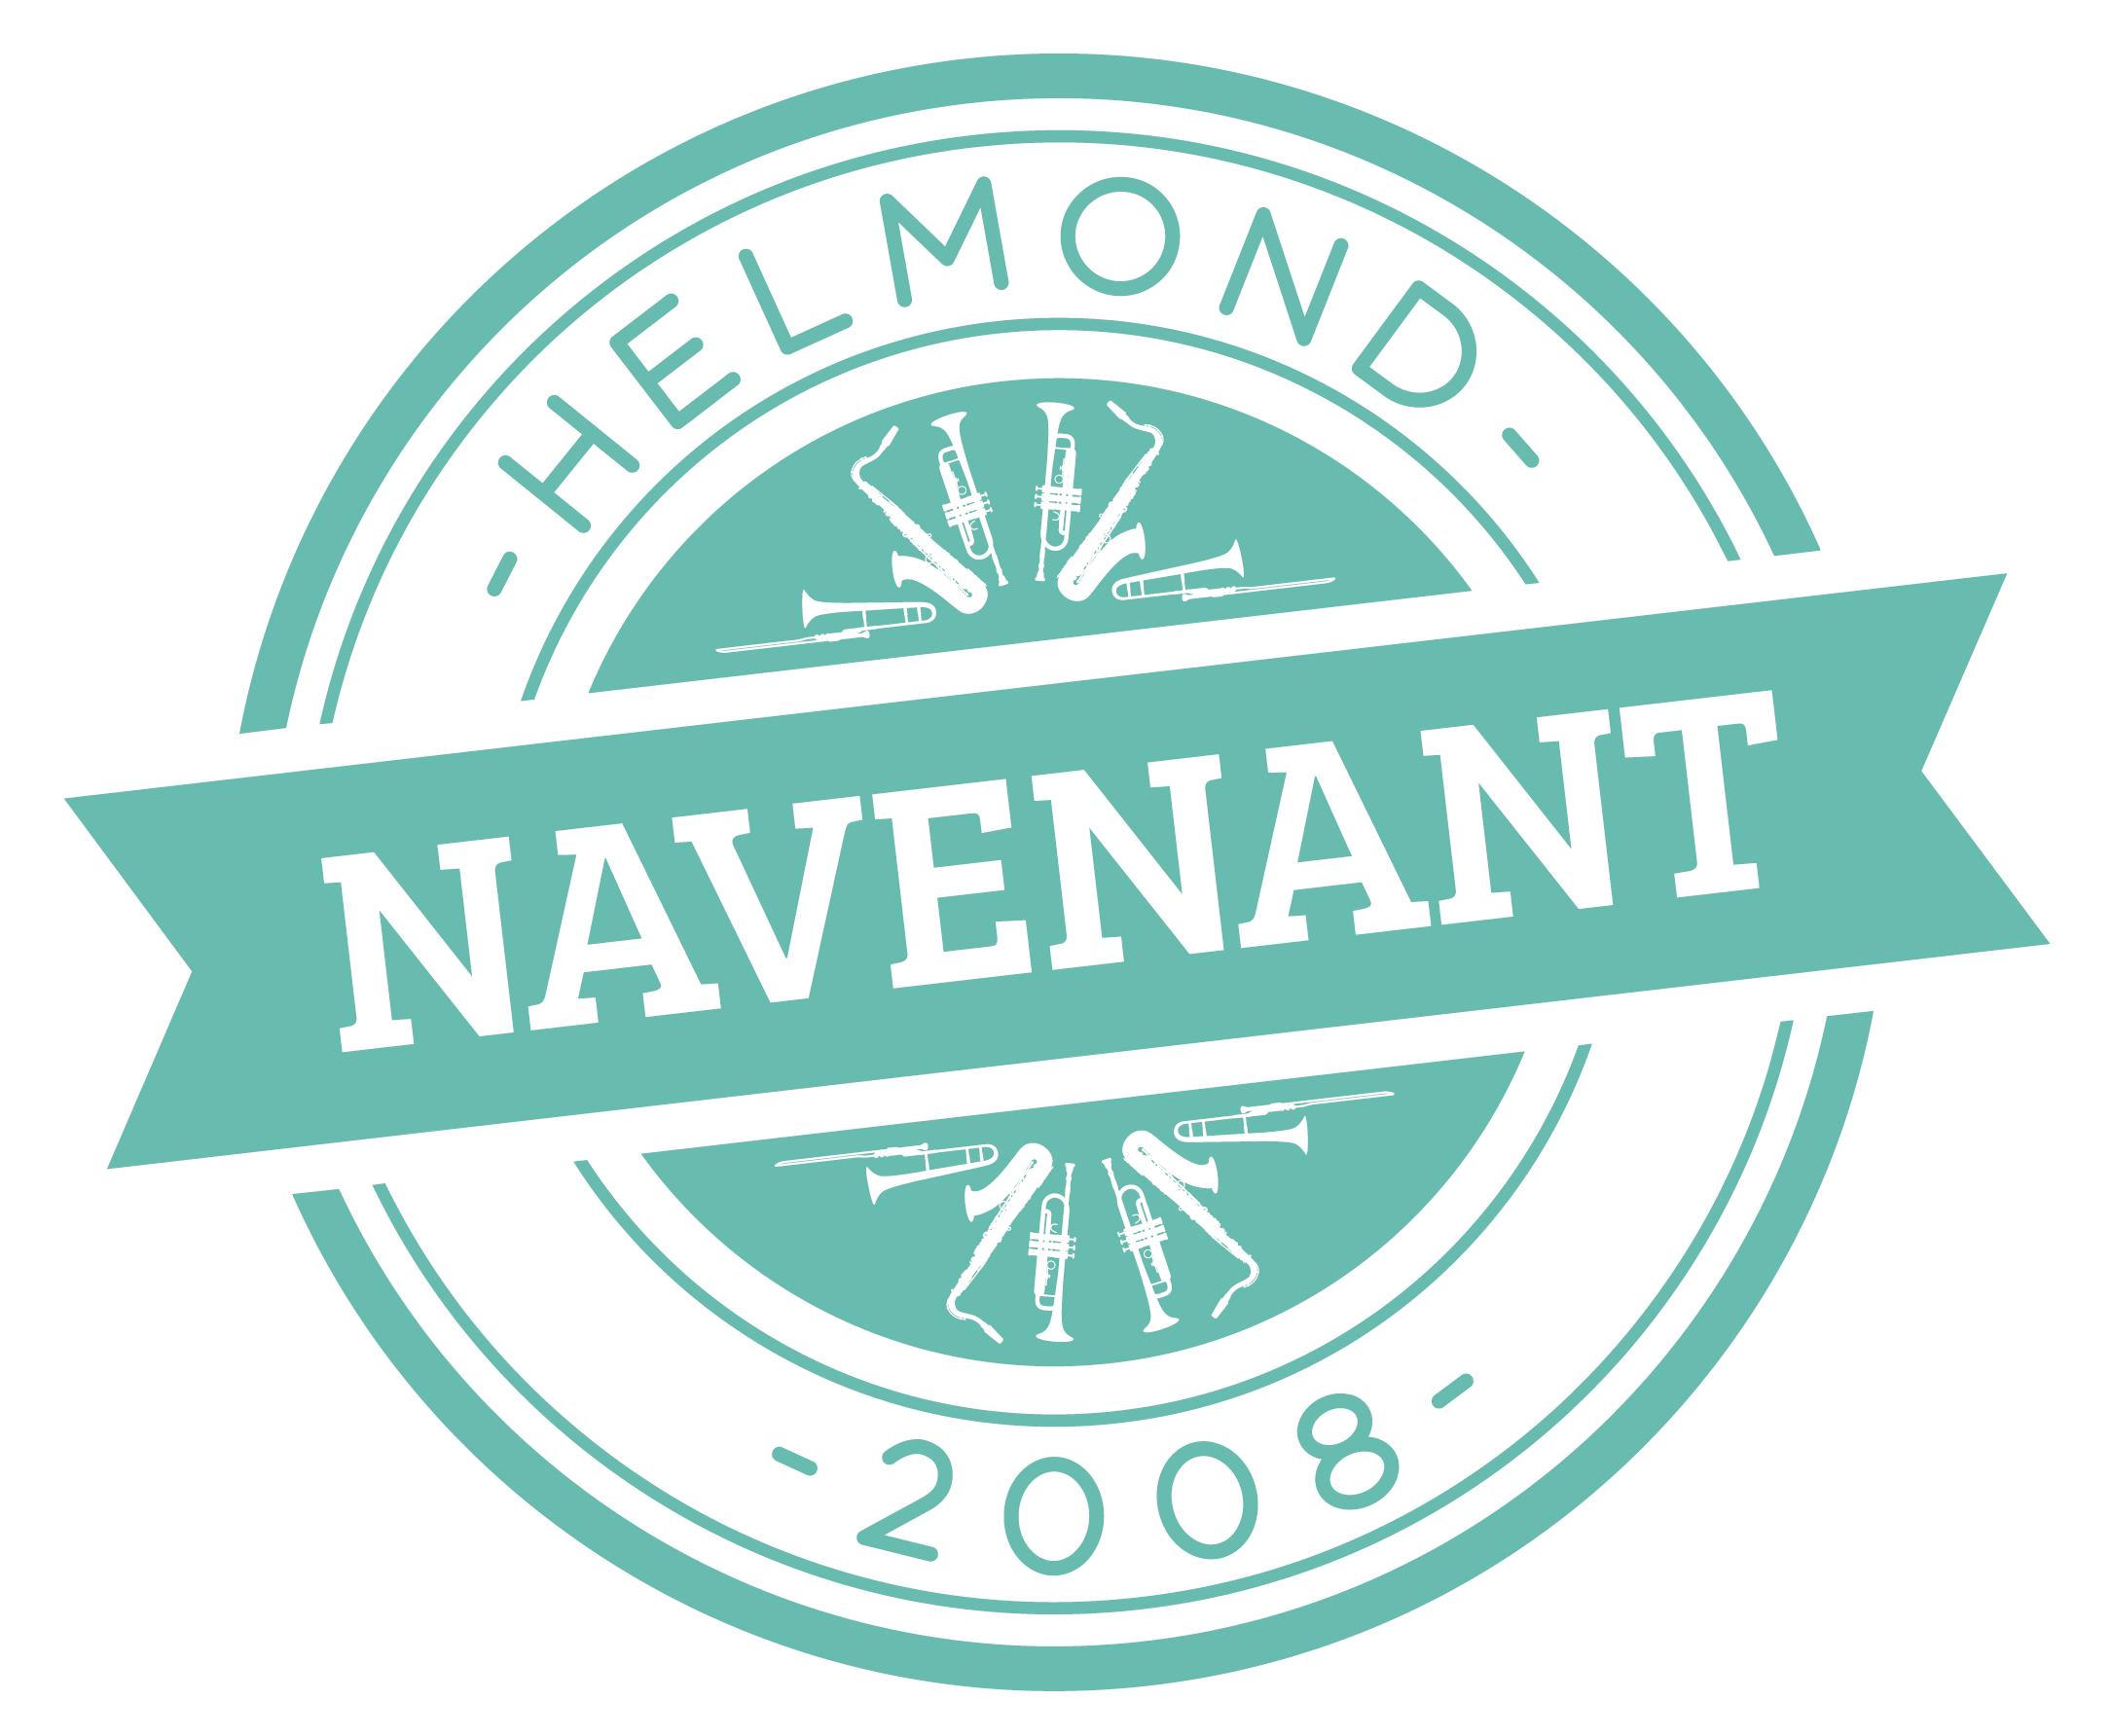 Navenant Helmond